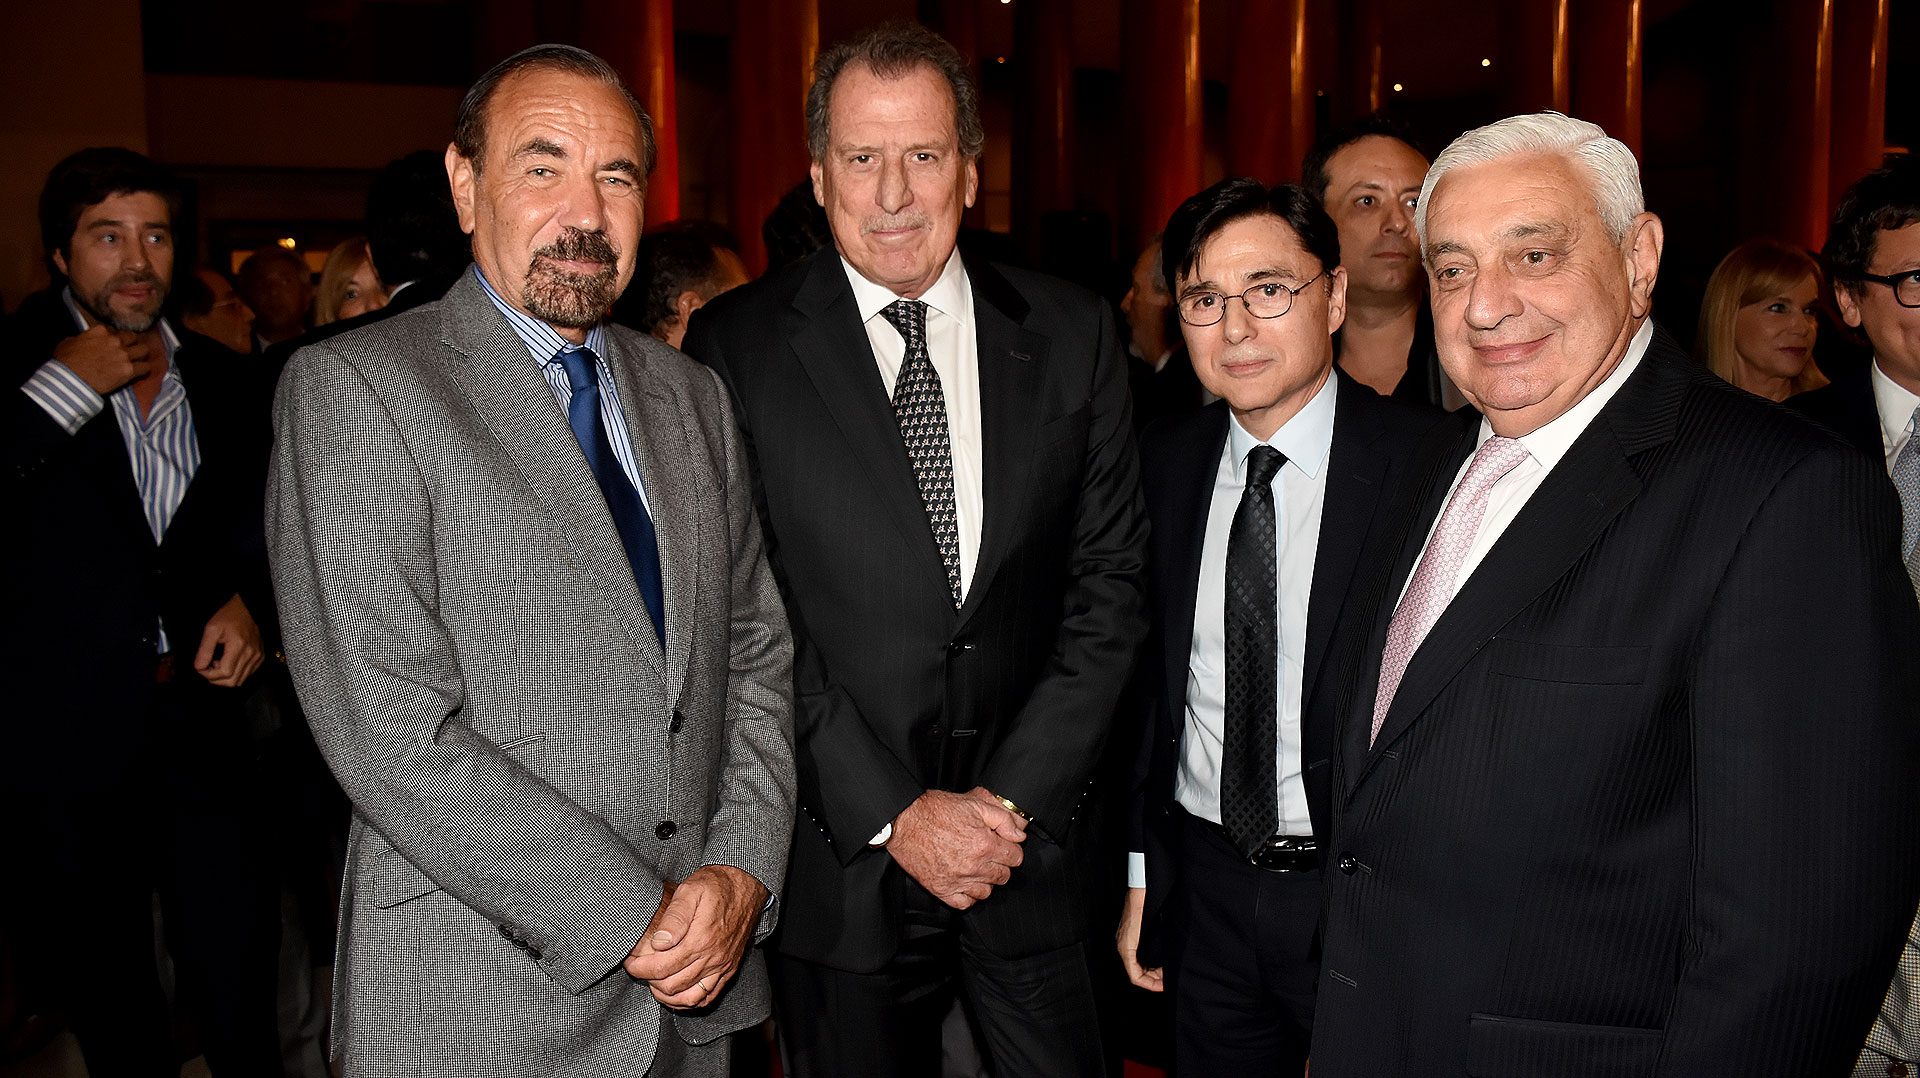 Jorge Pérez, presidente y CEO de The Related Group; Jorge Fontevecchia, CEO de Perfil; Jorge Brito, presidente del Banco Macro; y Adelmo Gabbi, titular de la Bolsa de Comercio (Nicolás Stulberg)